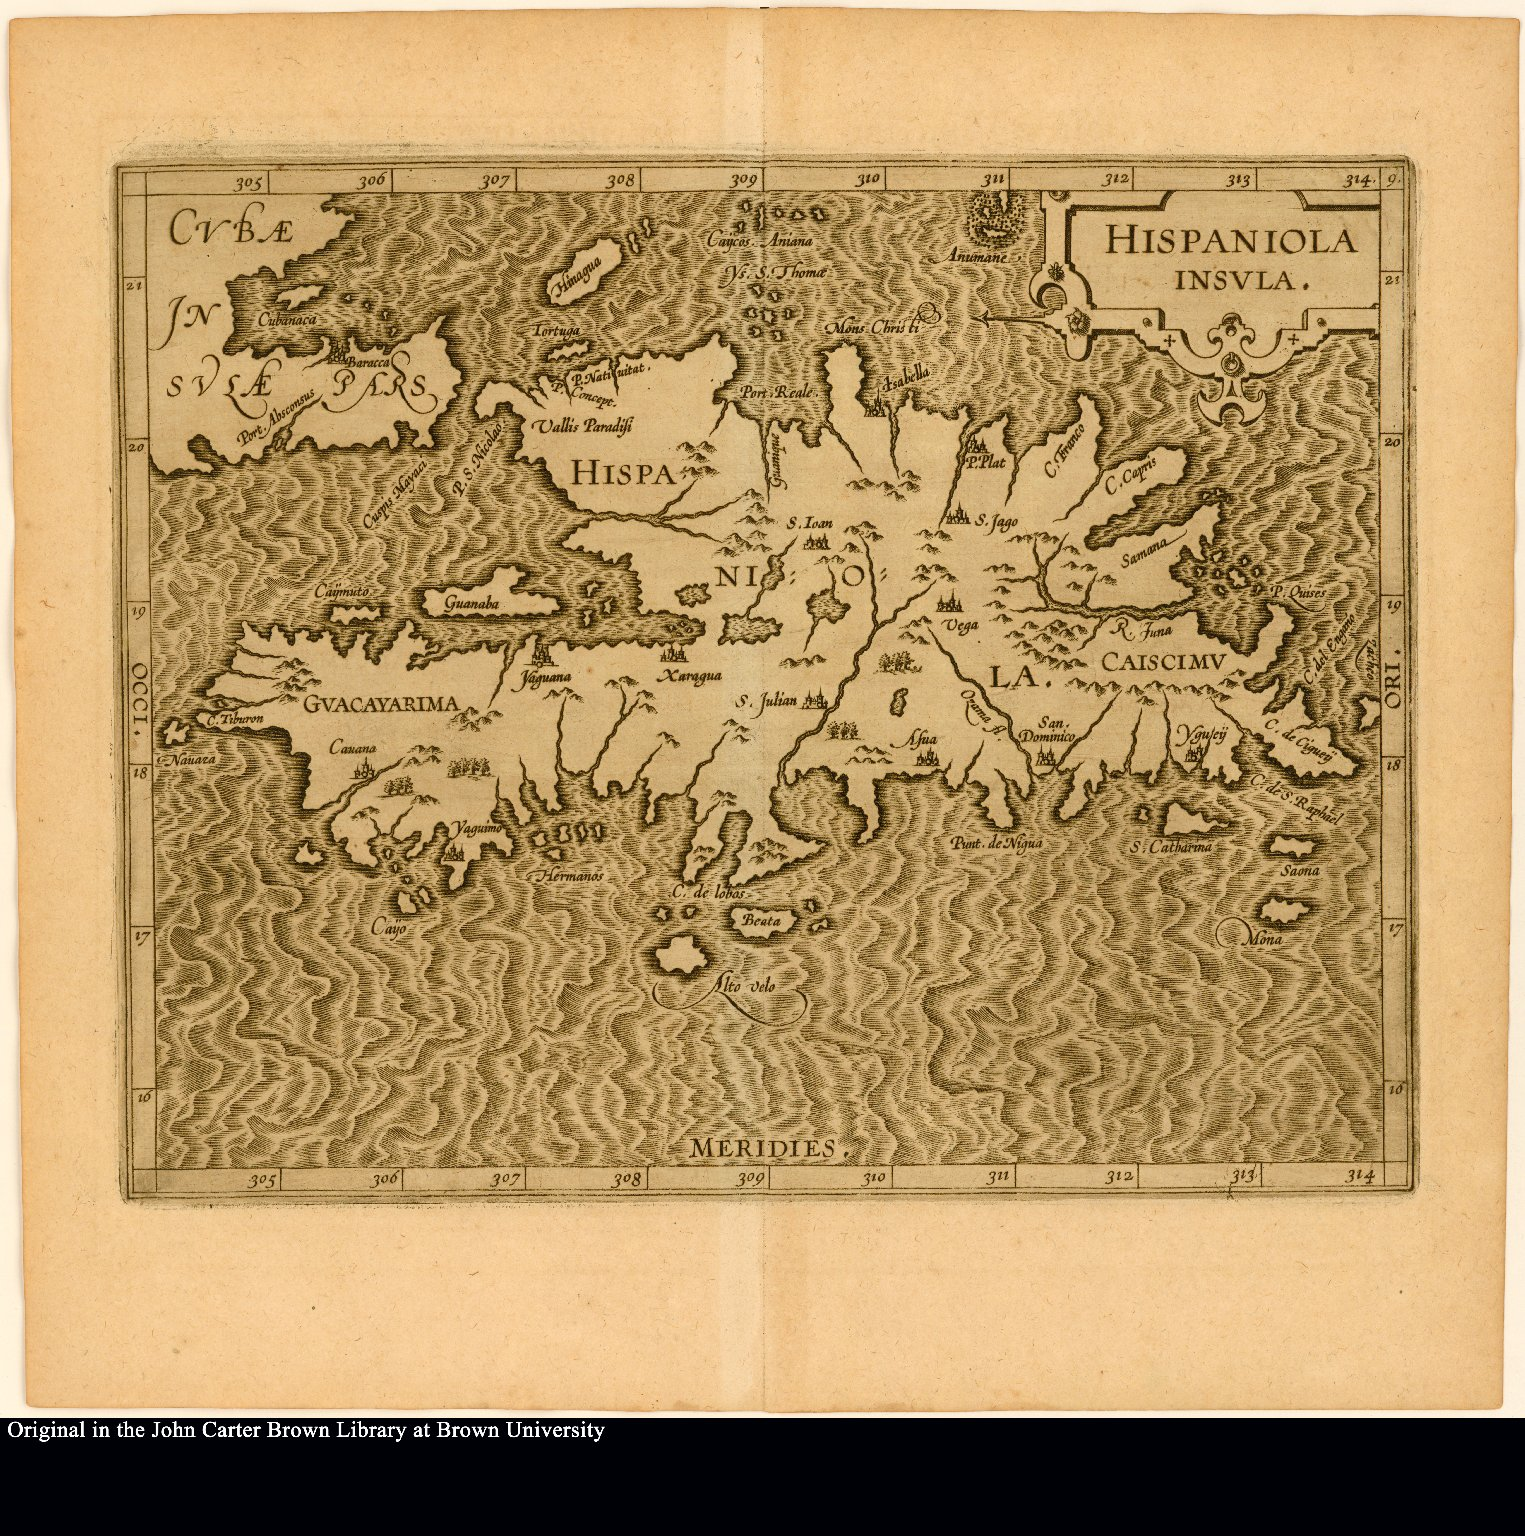 Hispaniola insula.